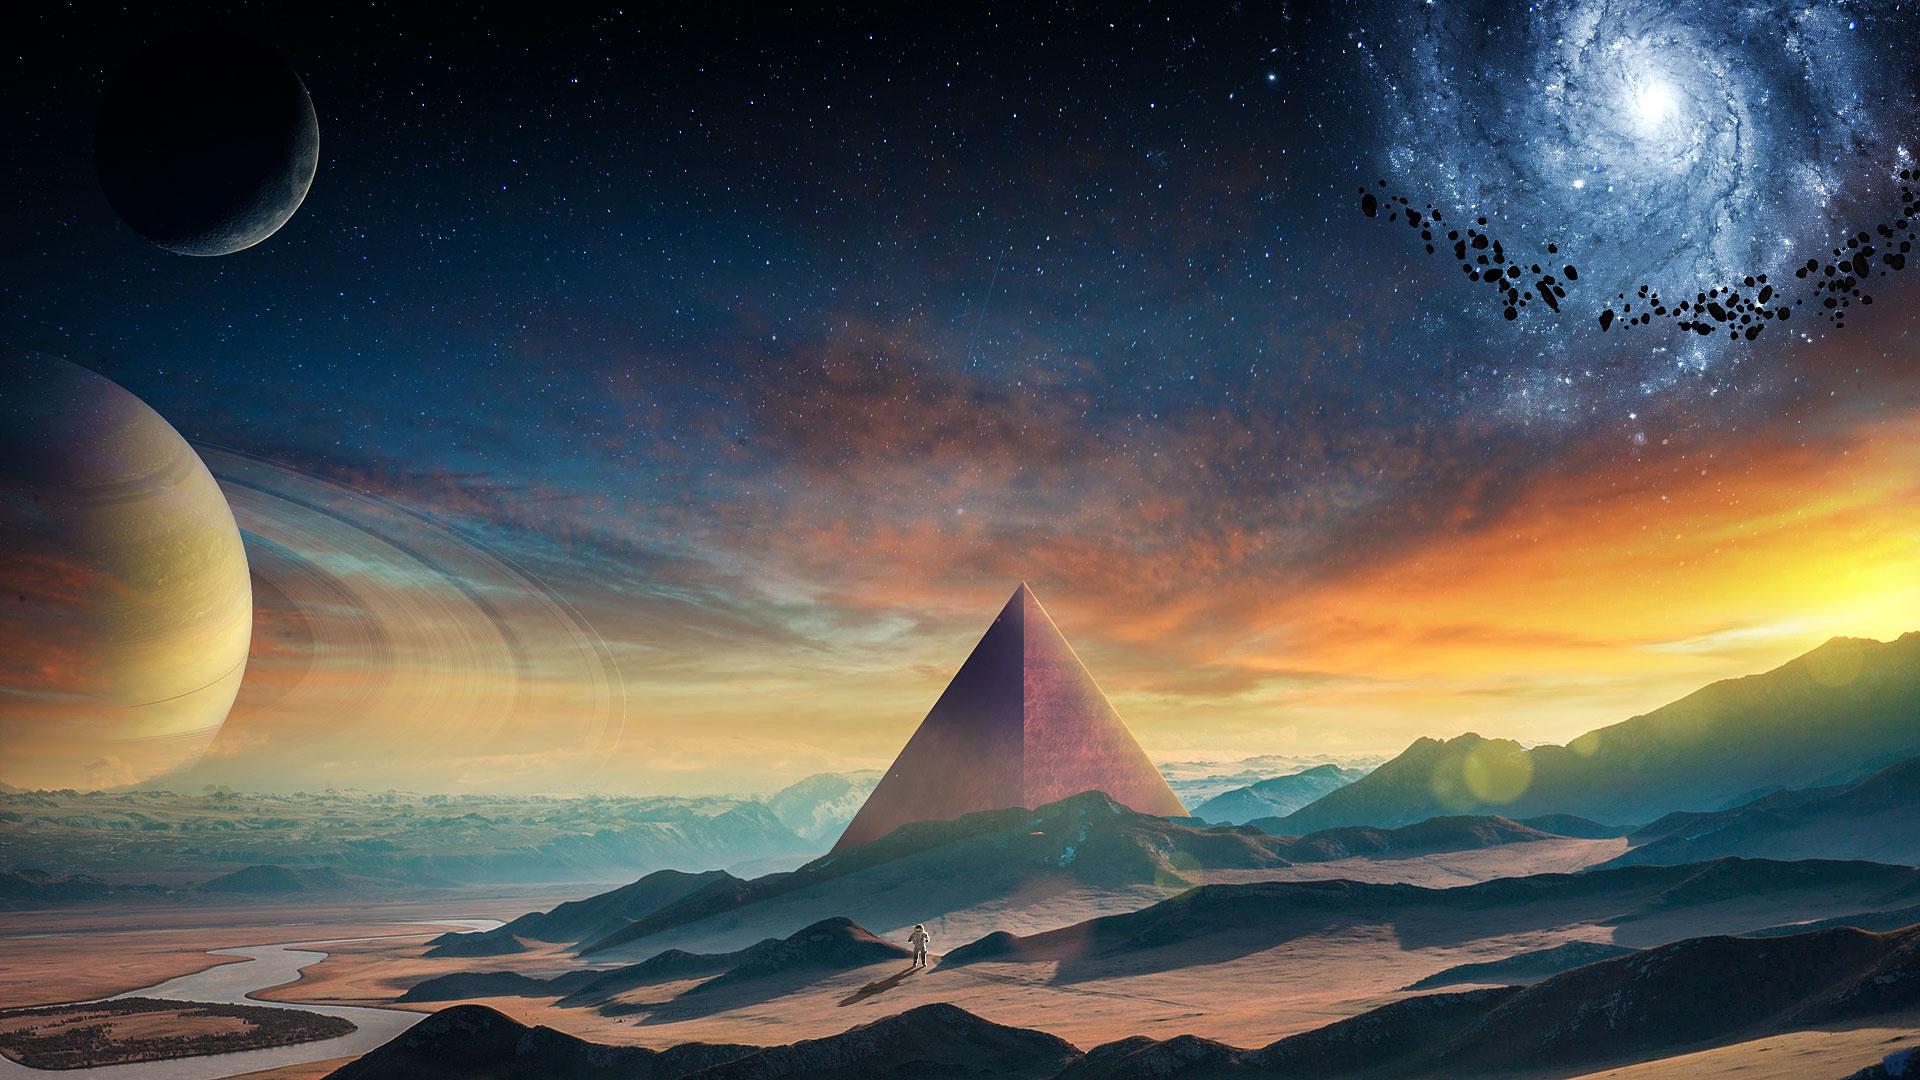 Download 1920x1080 Wallpaper Planet Fantasy Pyramids Space